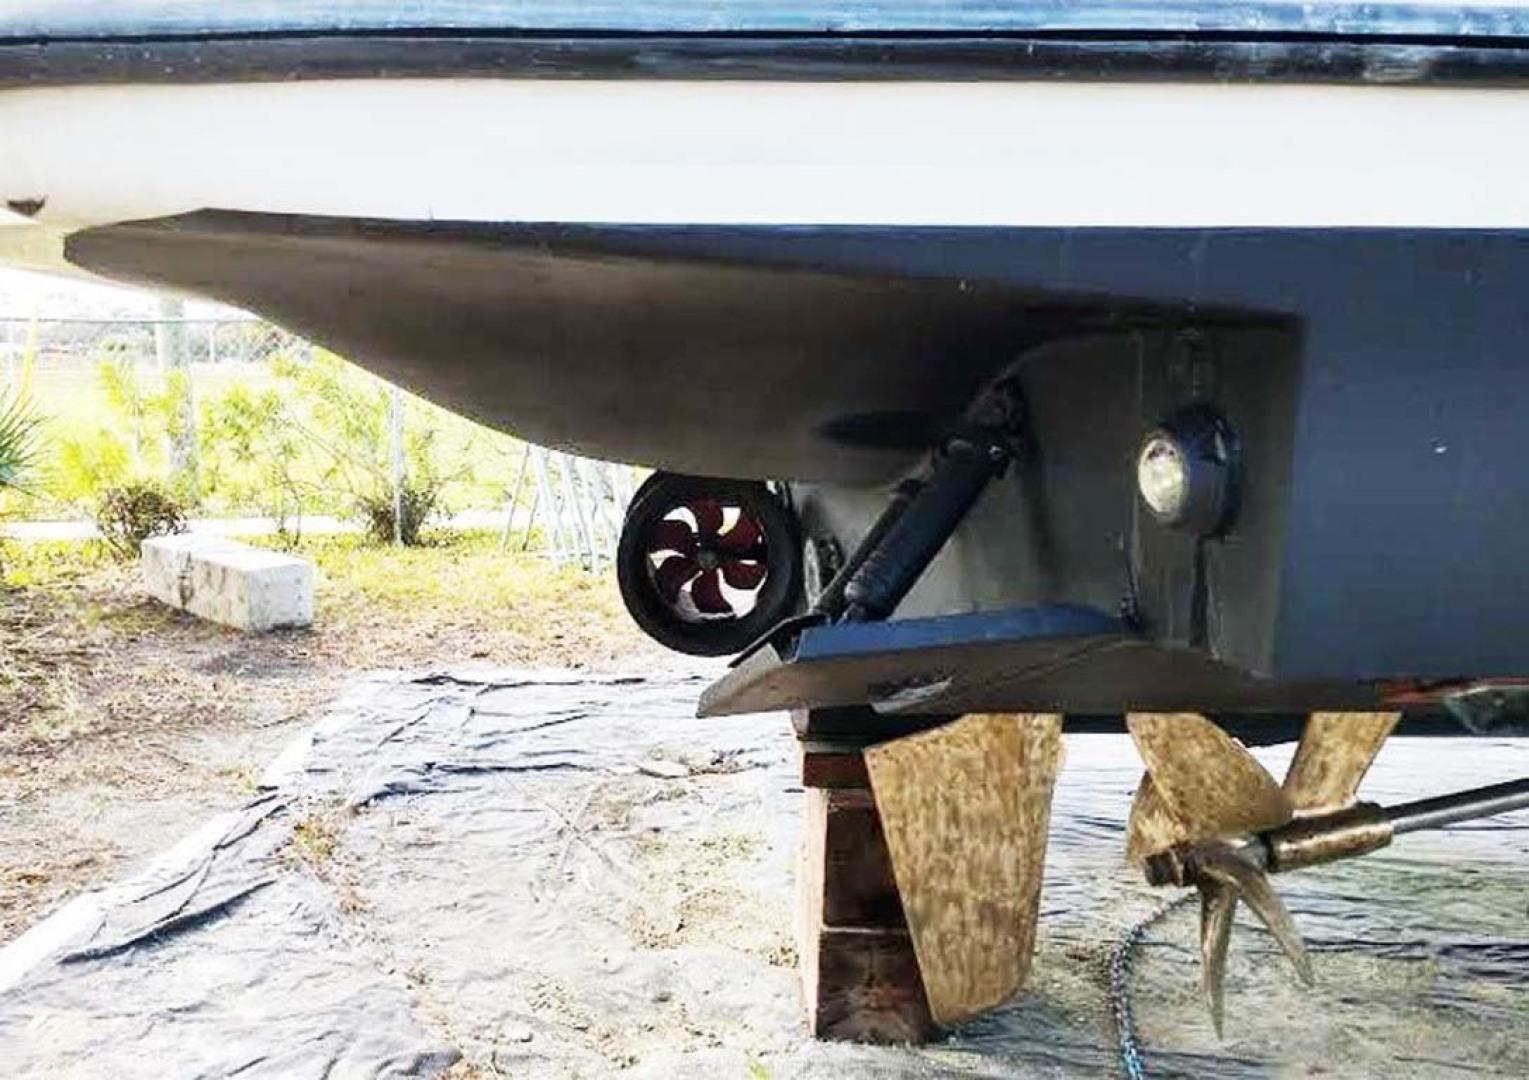 Azimut-46 Motor Yacht 2003-ChrAmy Melbourne-Florida-United States-Stern Thruster-1318902 | Thumbnail